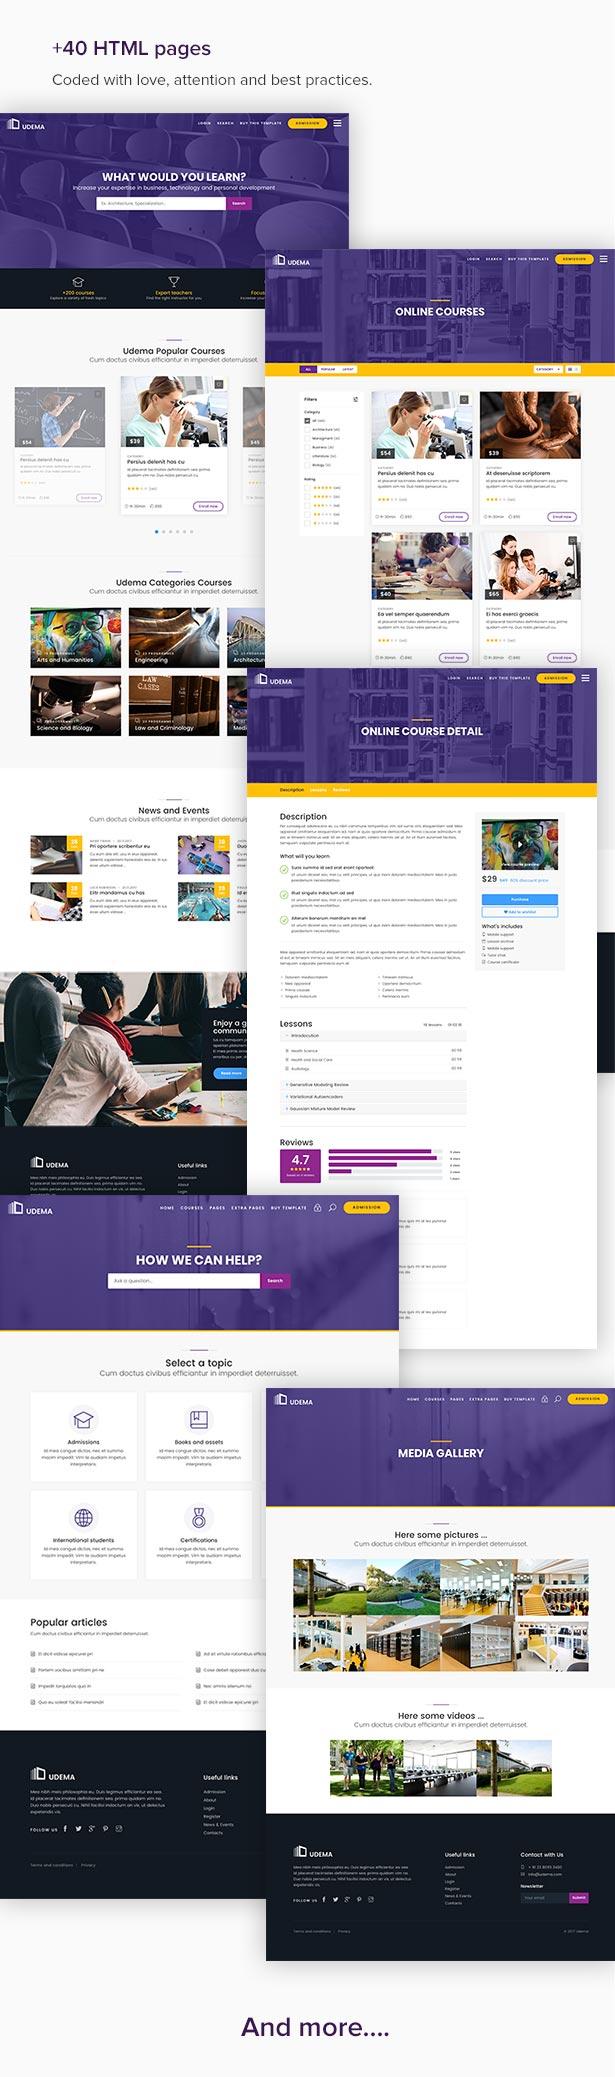 UDEMA - Modern Educational Site Template LMS